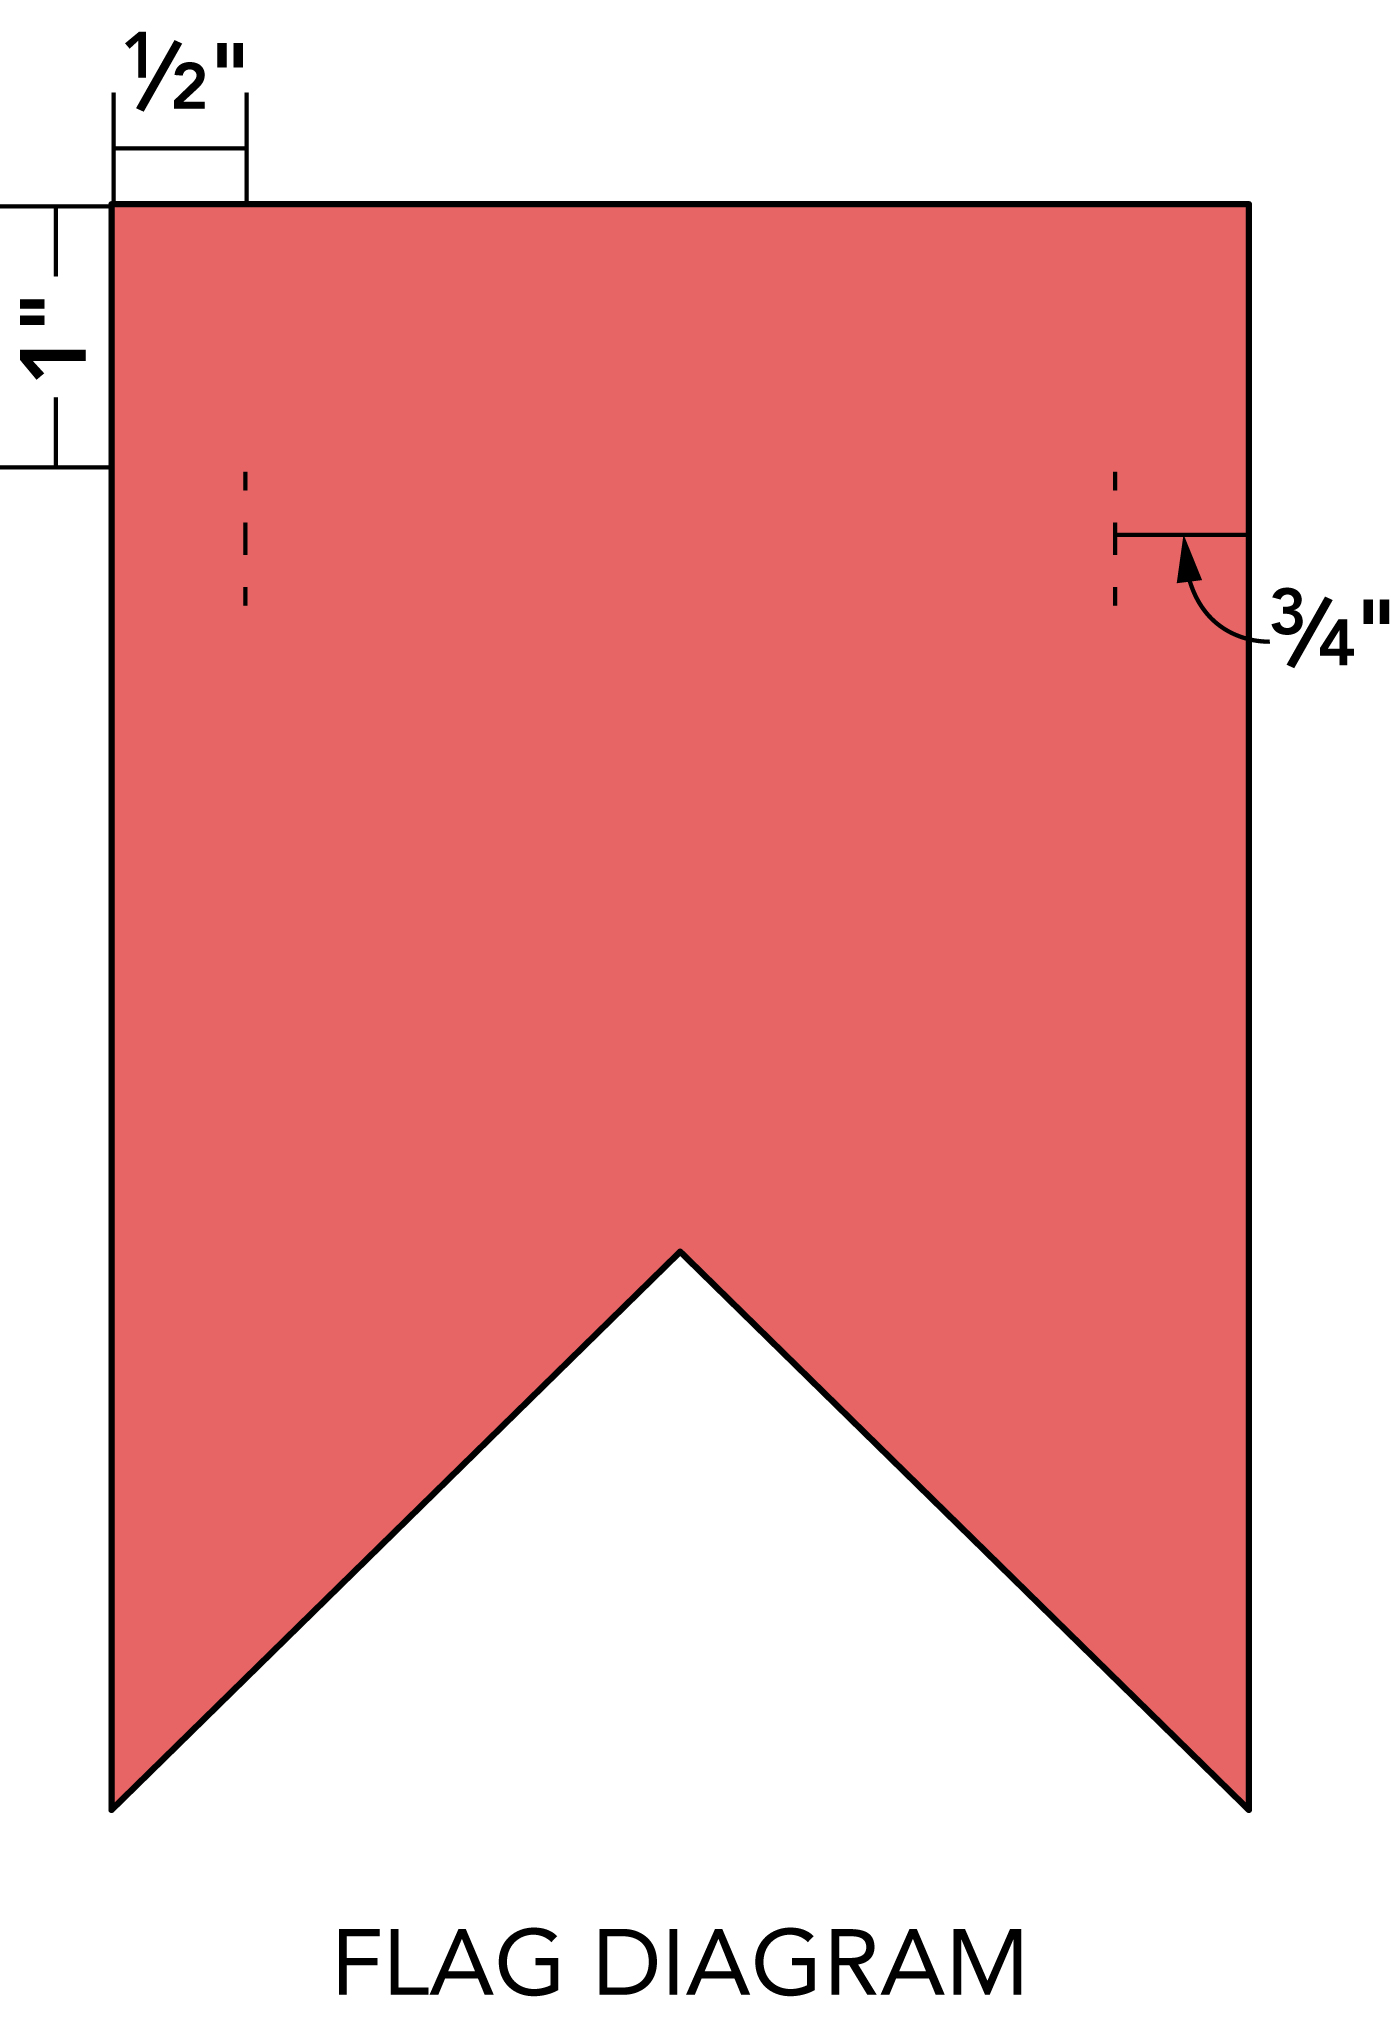 7002432-10562_buntingflag.jpg